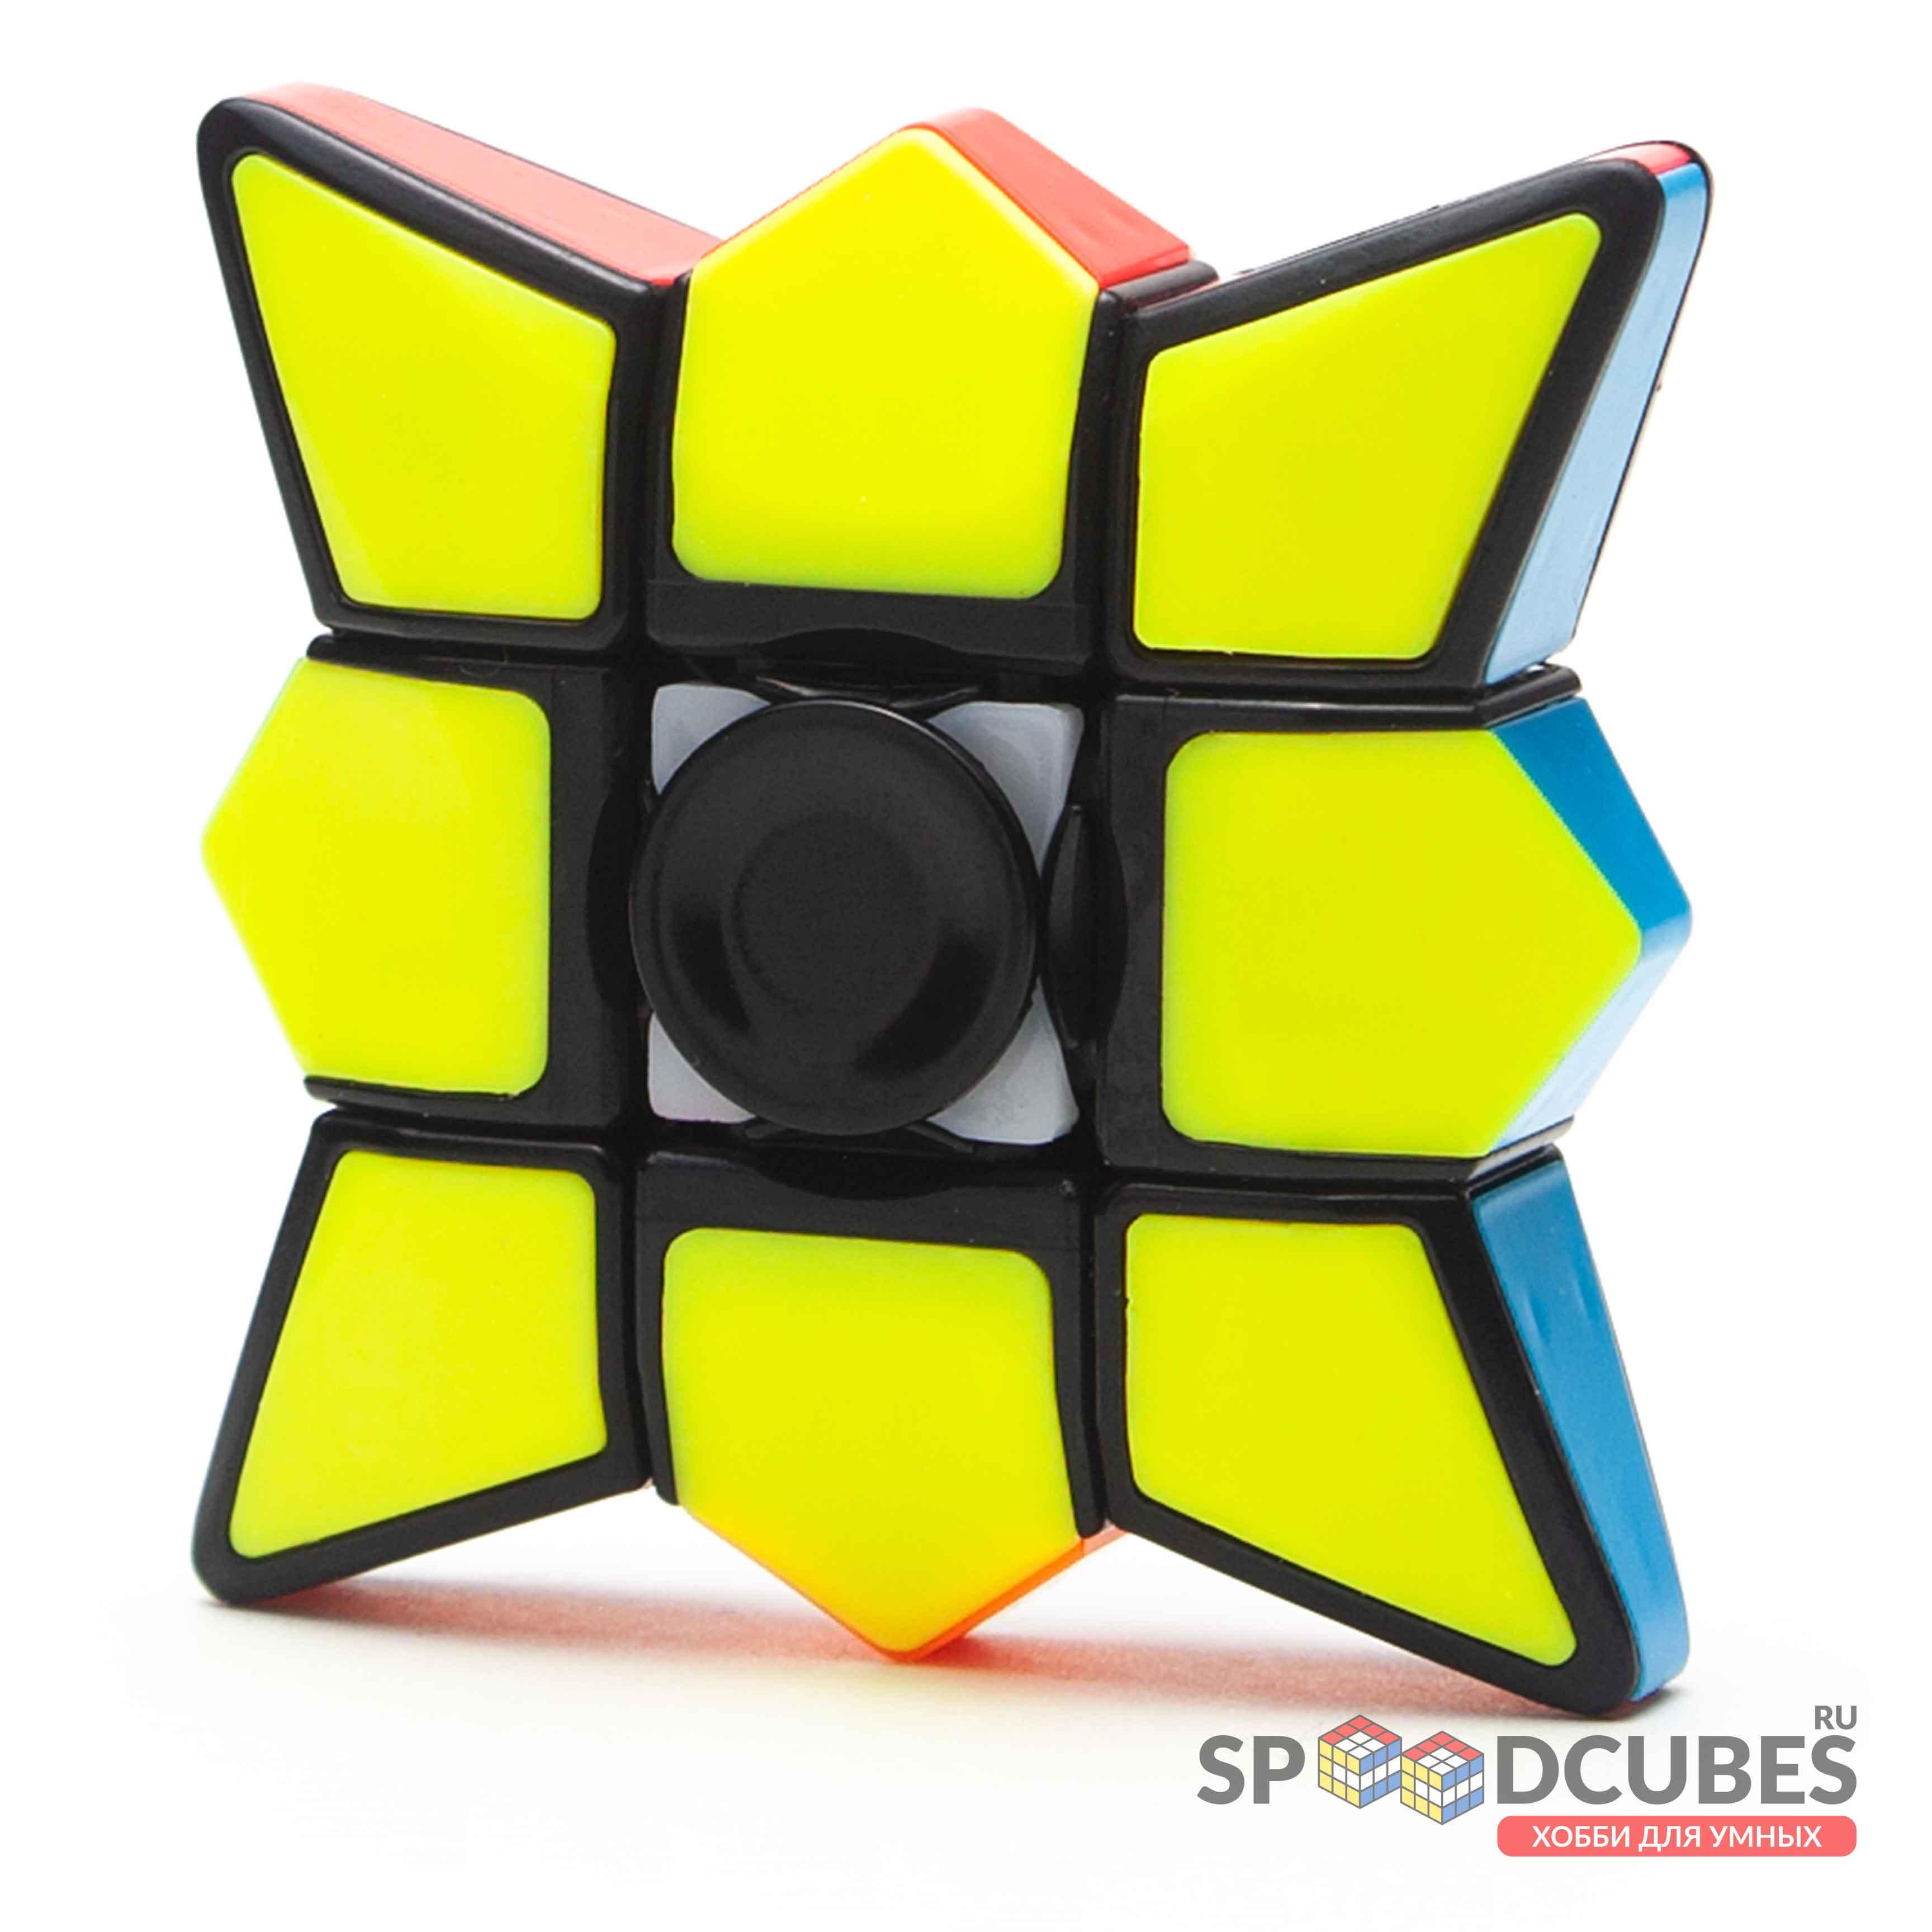 Fanxin 1x3x3 Spinner Floppy